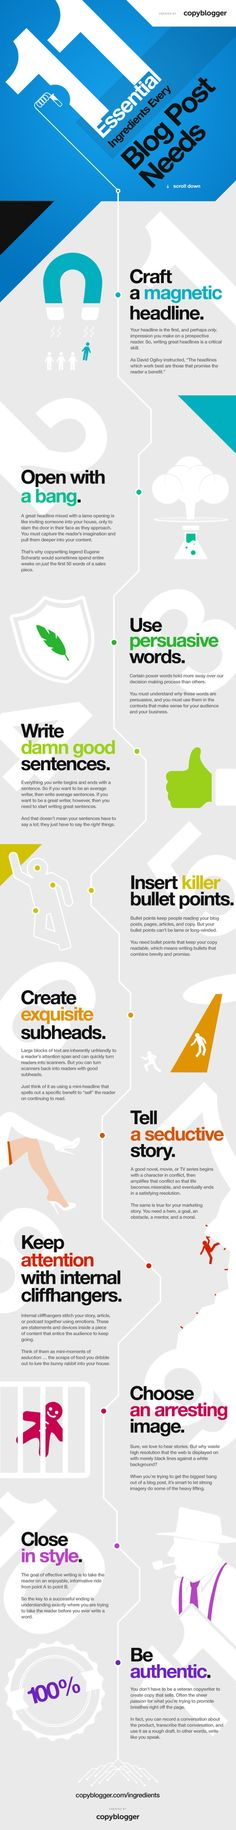 essential blog post ingredients infographic